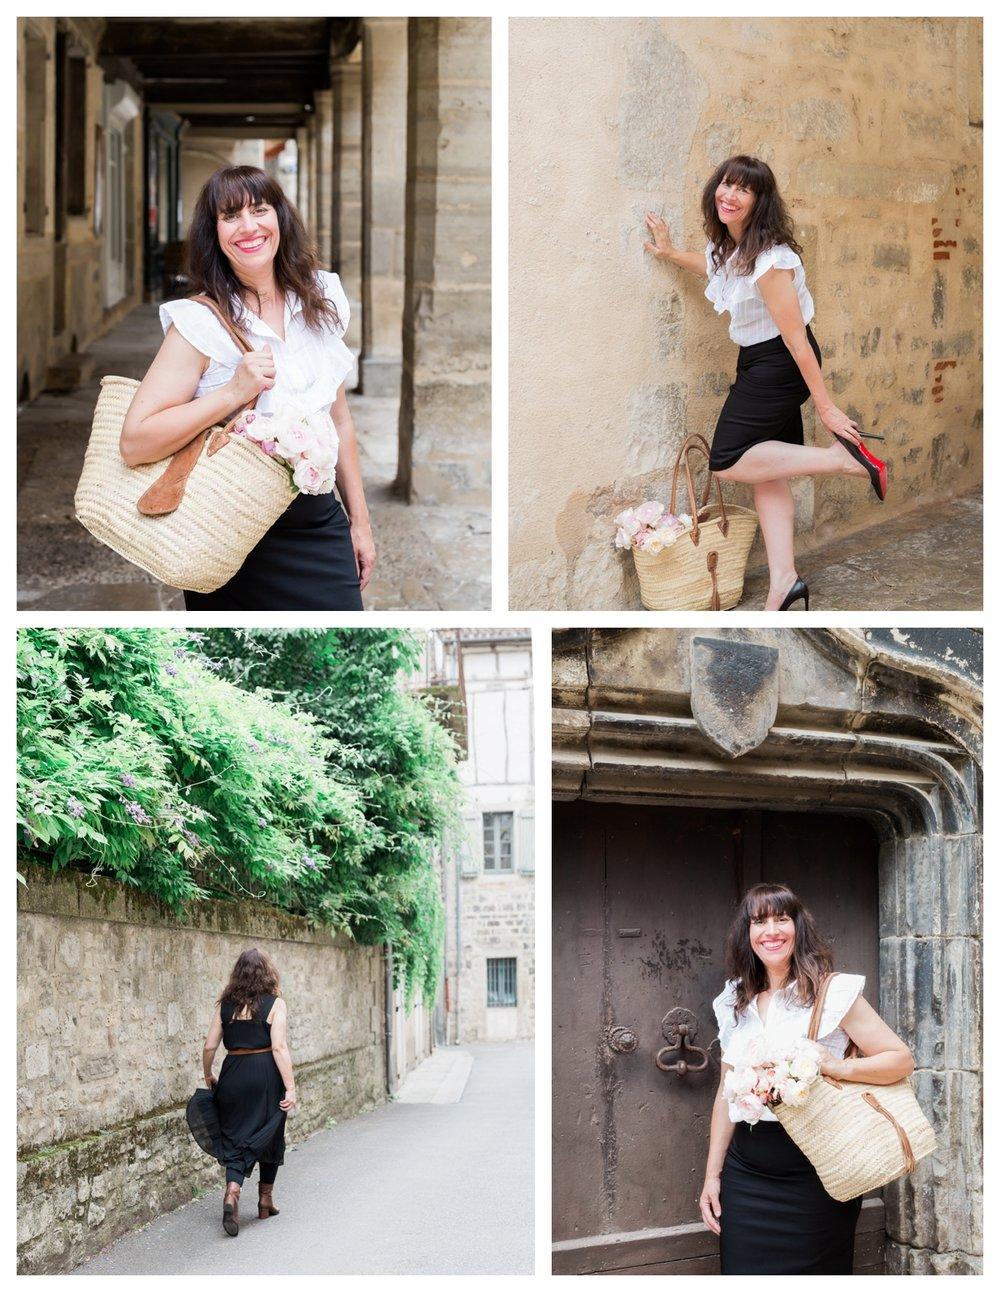 Personal Branding Photoshoot for Corrina Tough Photography